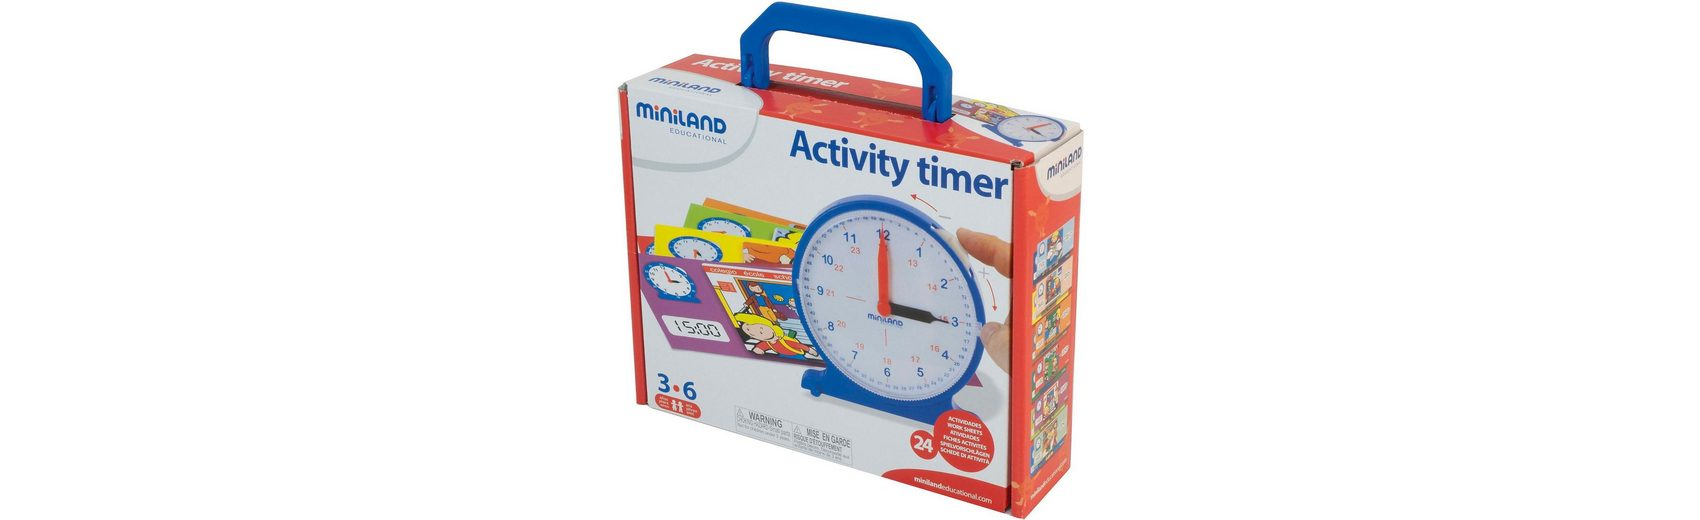 Miniland Activity Timer - Lernuhr